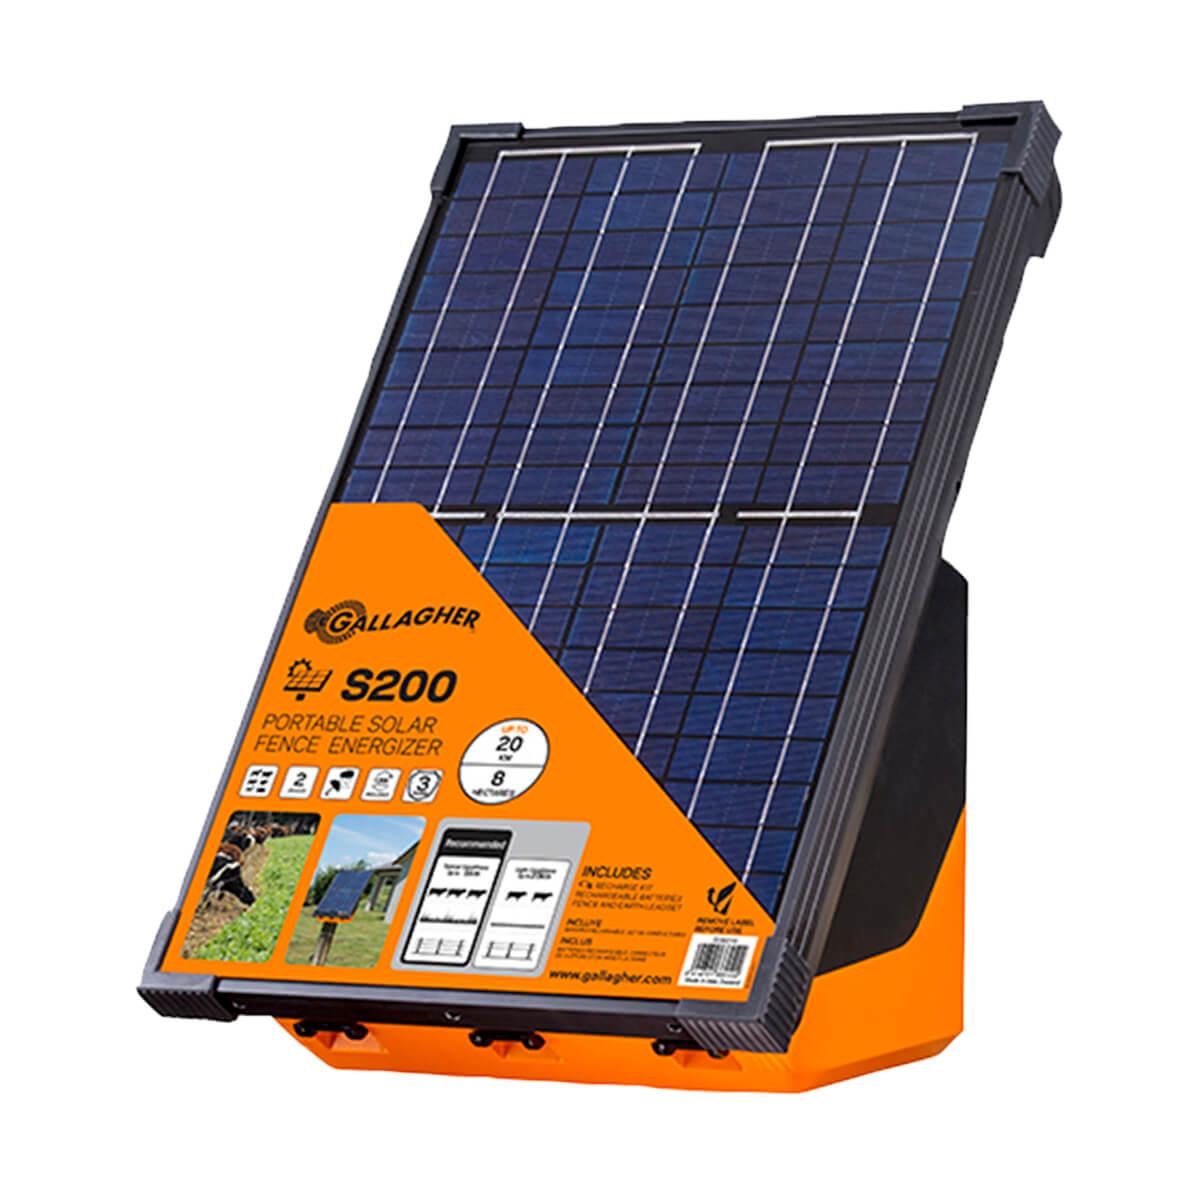 Gallagher - Solar Fence Energizer - S200